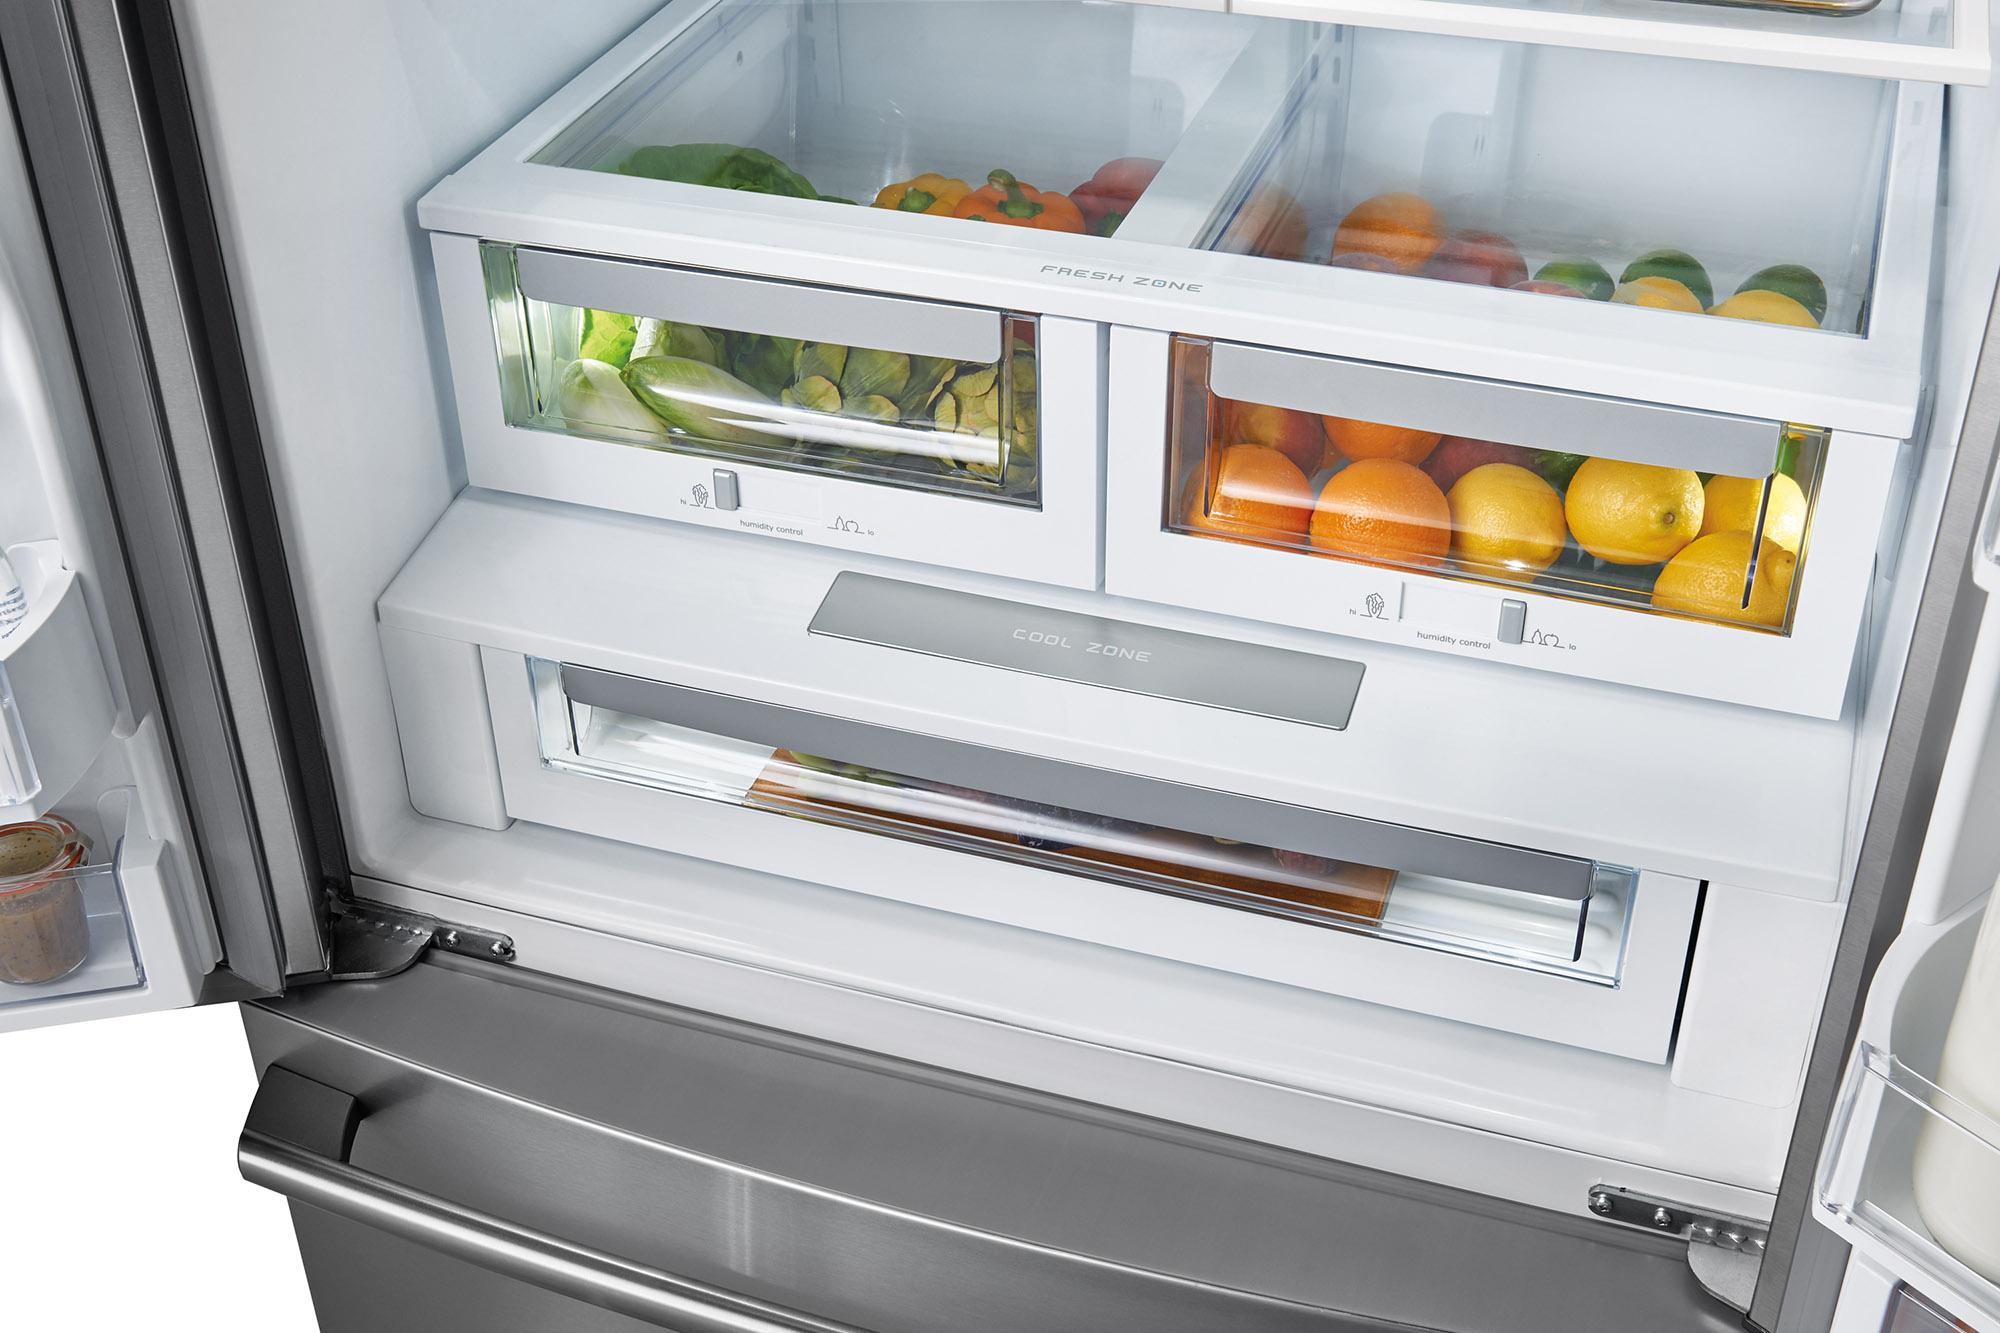 224 Cu Ft Counter Depth French Door Refrigerator Stainless Steel